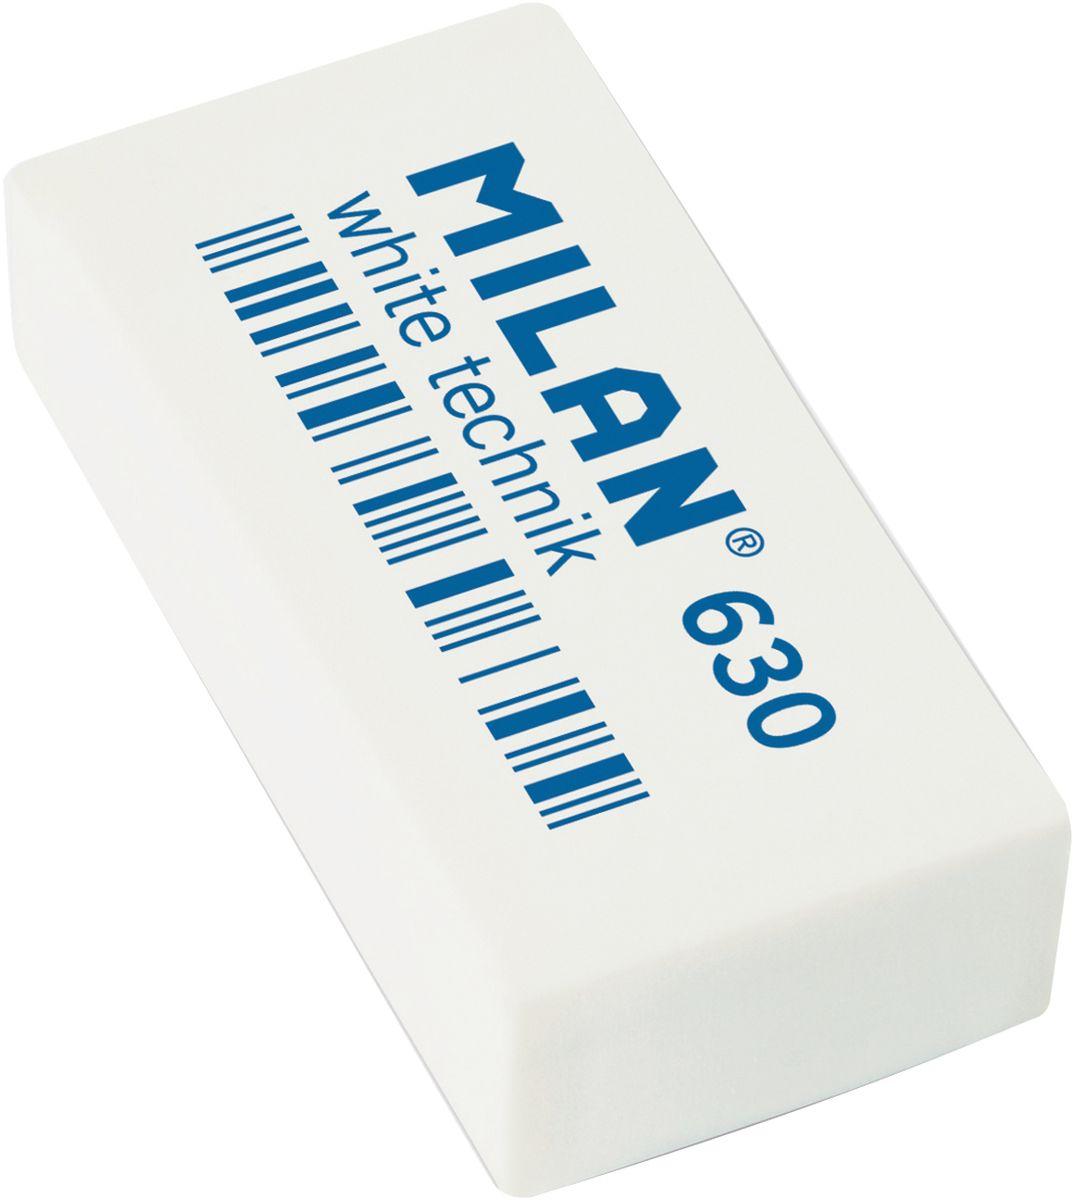 Milan Ластик White Technic 630 прямоугольный